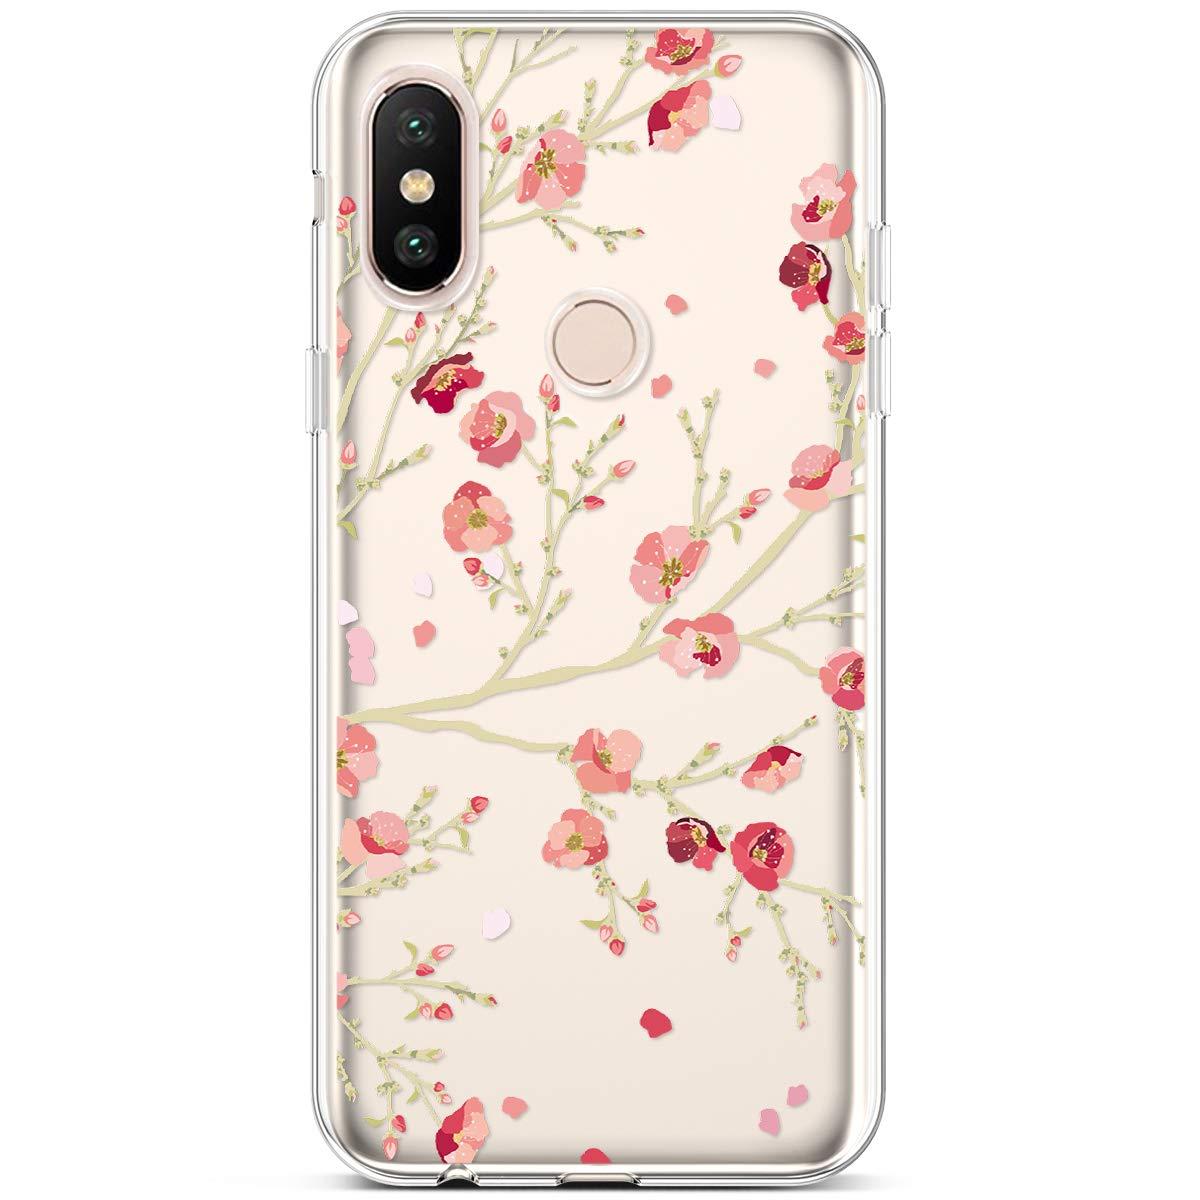 Flamingo Rosa Handyh/ülle Xiaomi Mi A2 Lite Bunte Muster Weiche TPU Silikon Transparent Back Case Cover Tasche Etui Schutzh/ülle 1 x Hpory Stylus Hpory Kompatibel mit Xiaomi Mi A2 Lite H/ülle